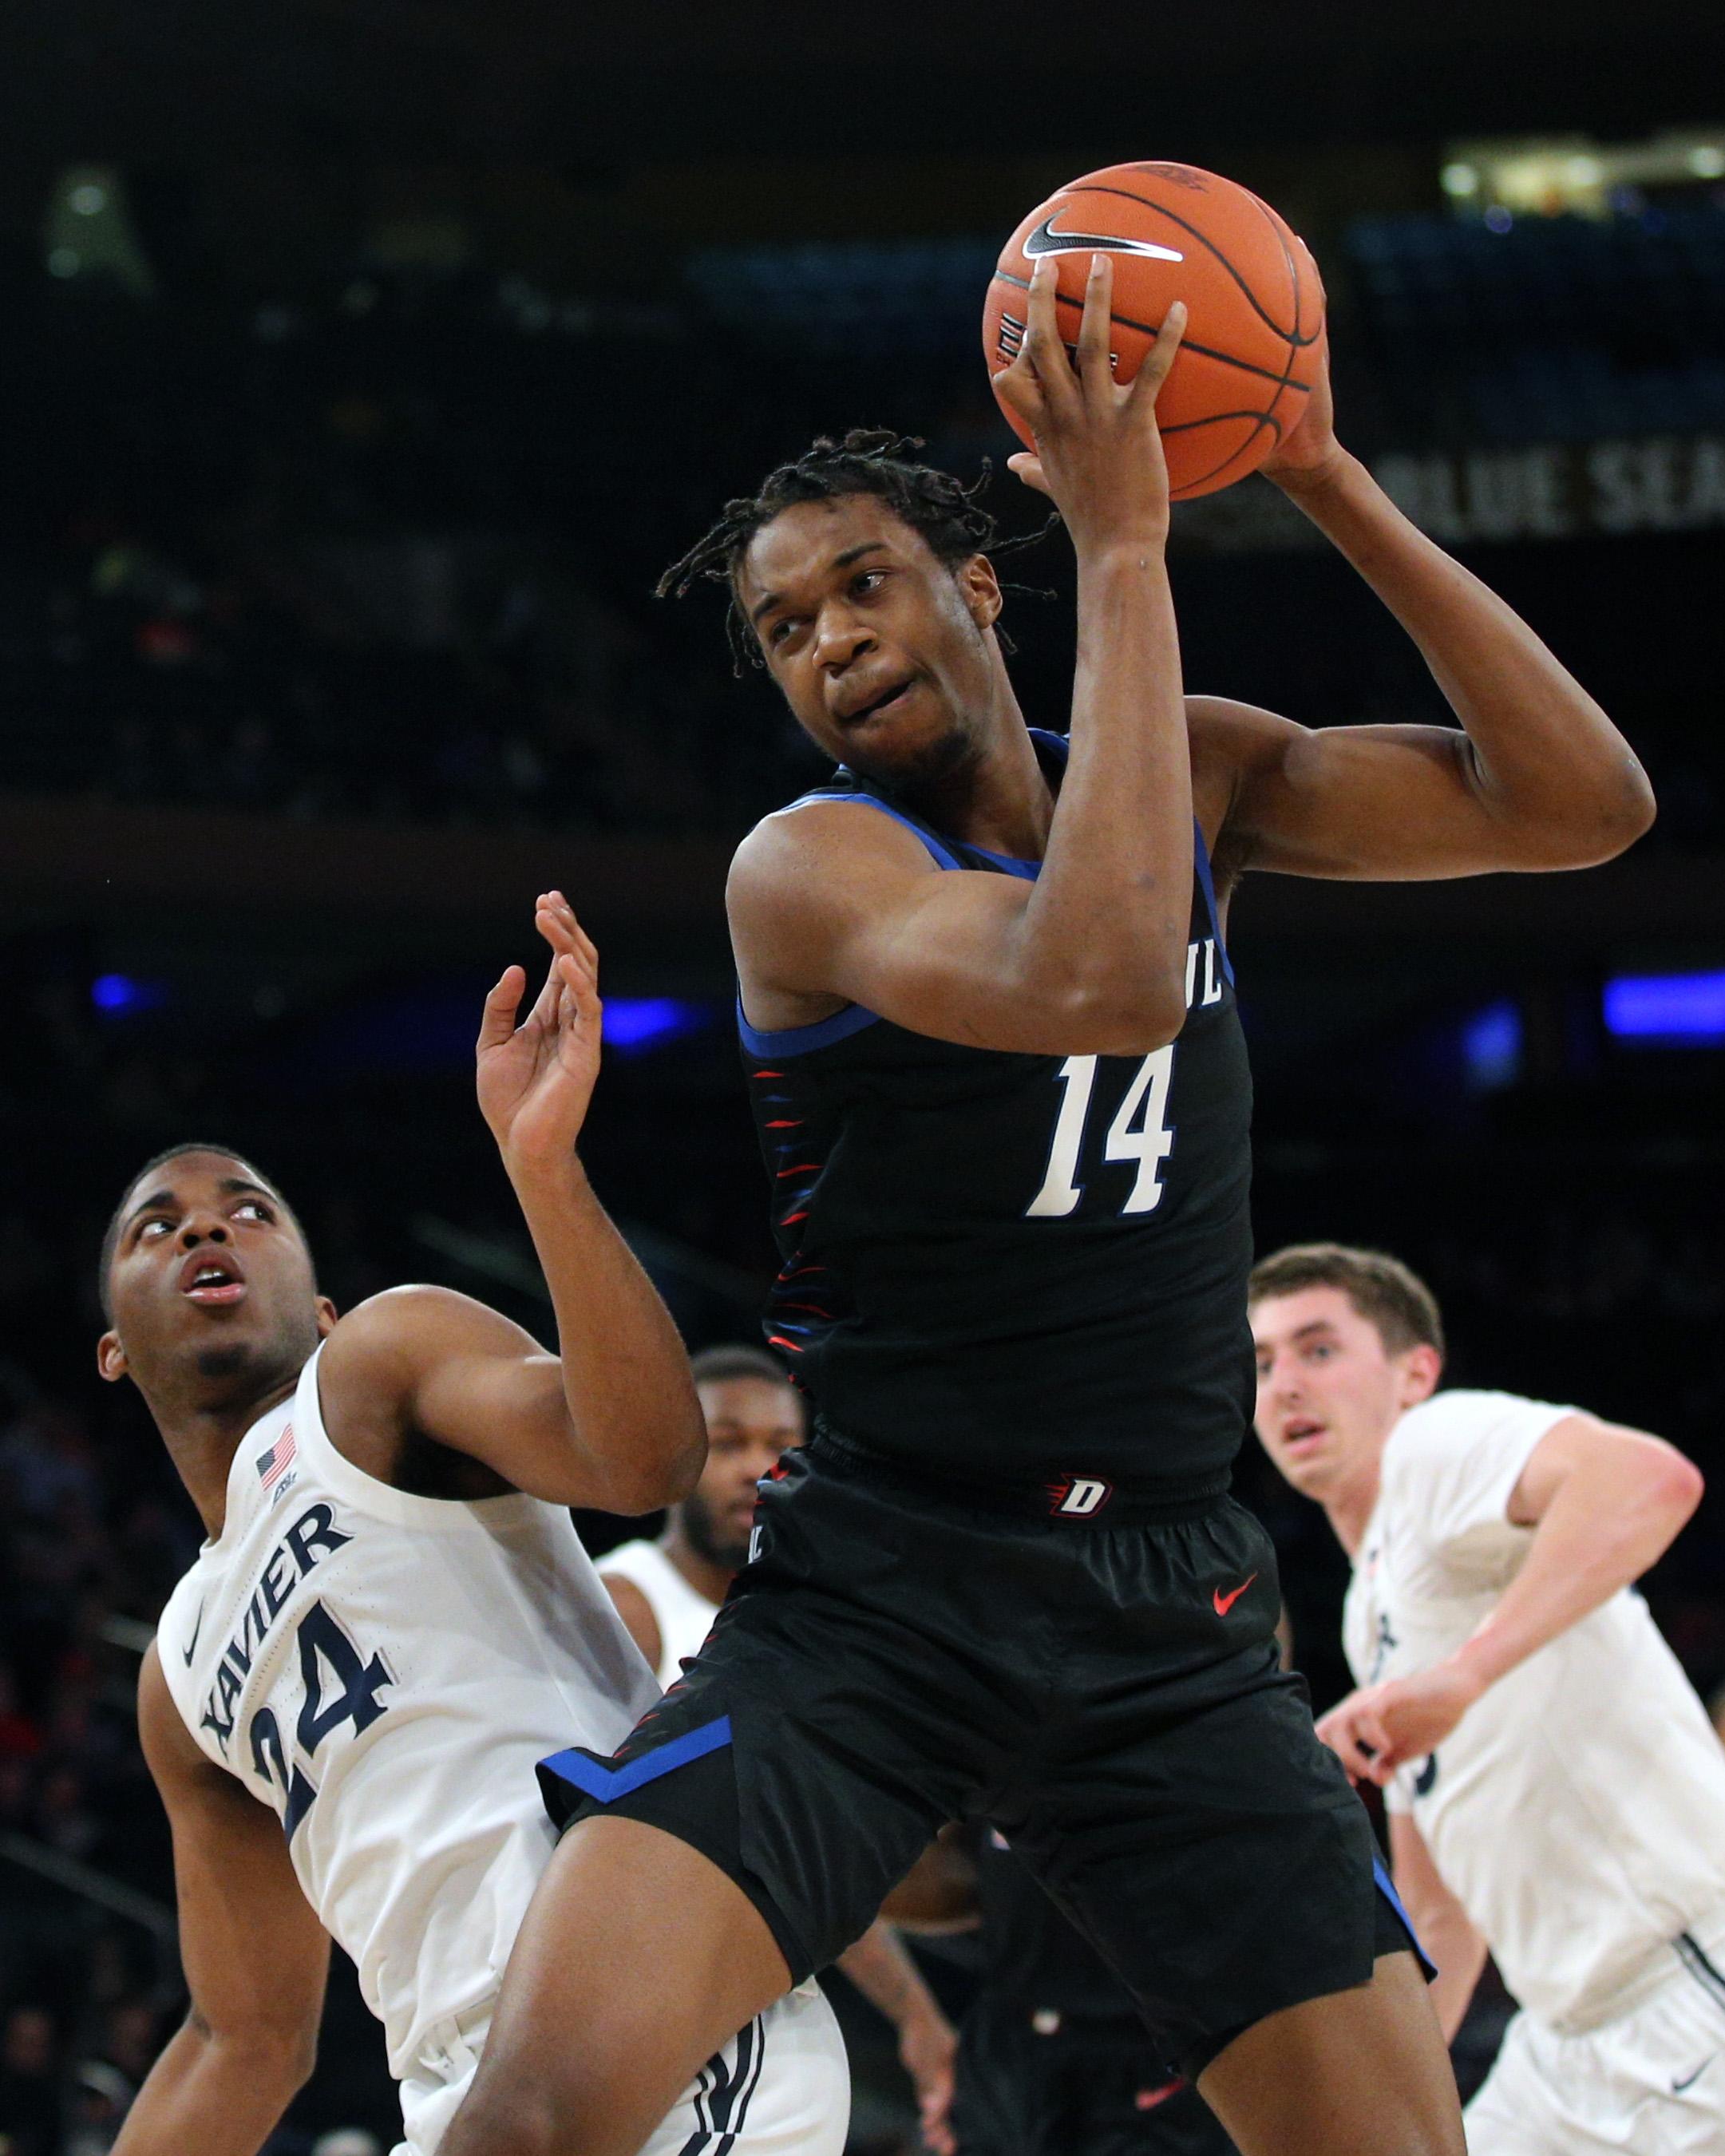 NCAA Basketball: Big East Tournament-Xavier vs DePaul